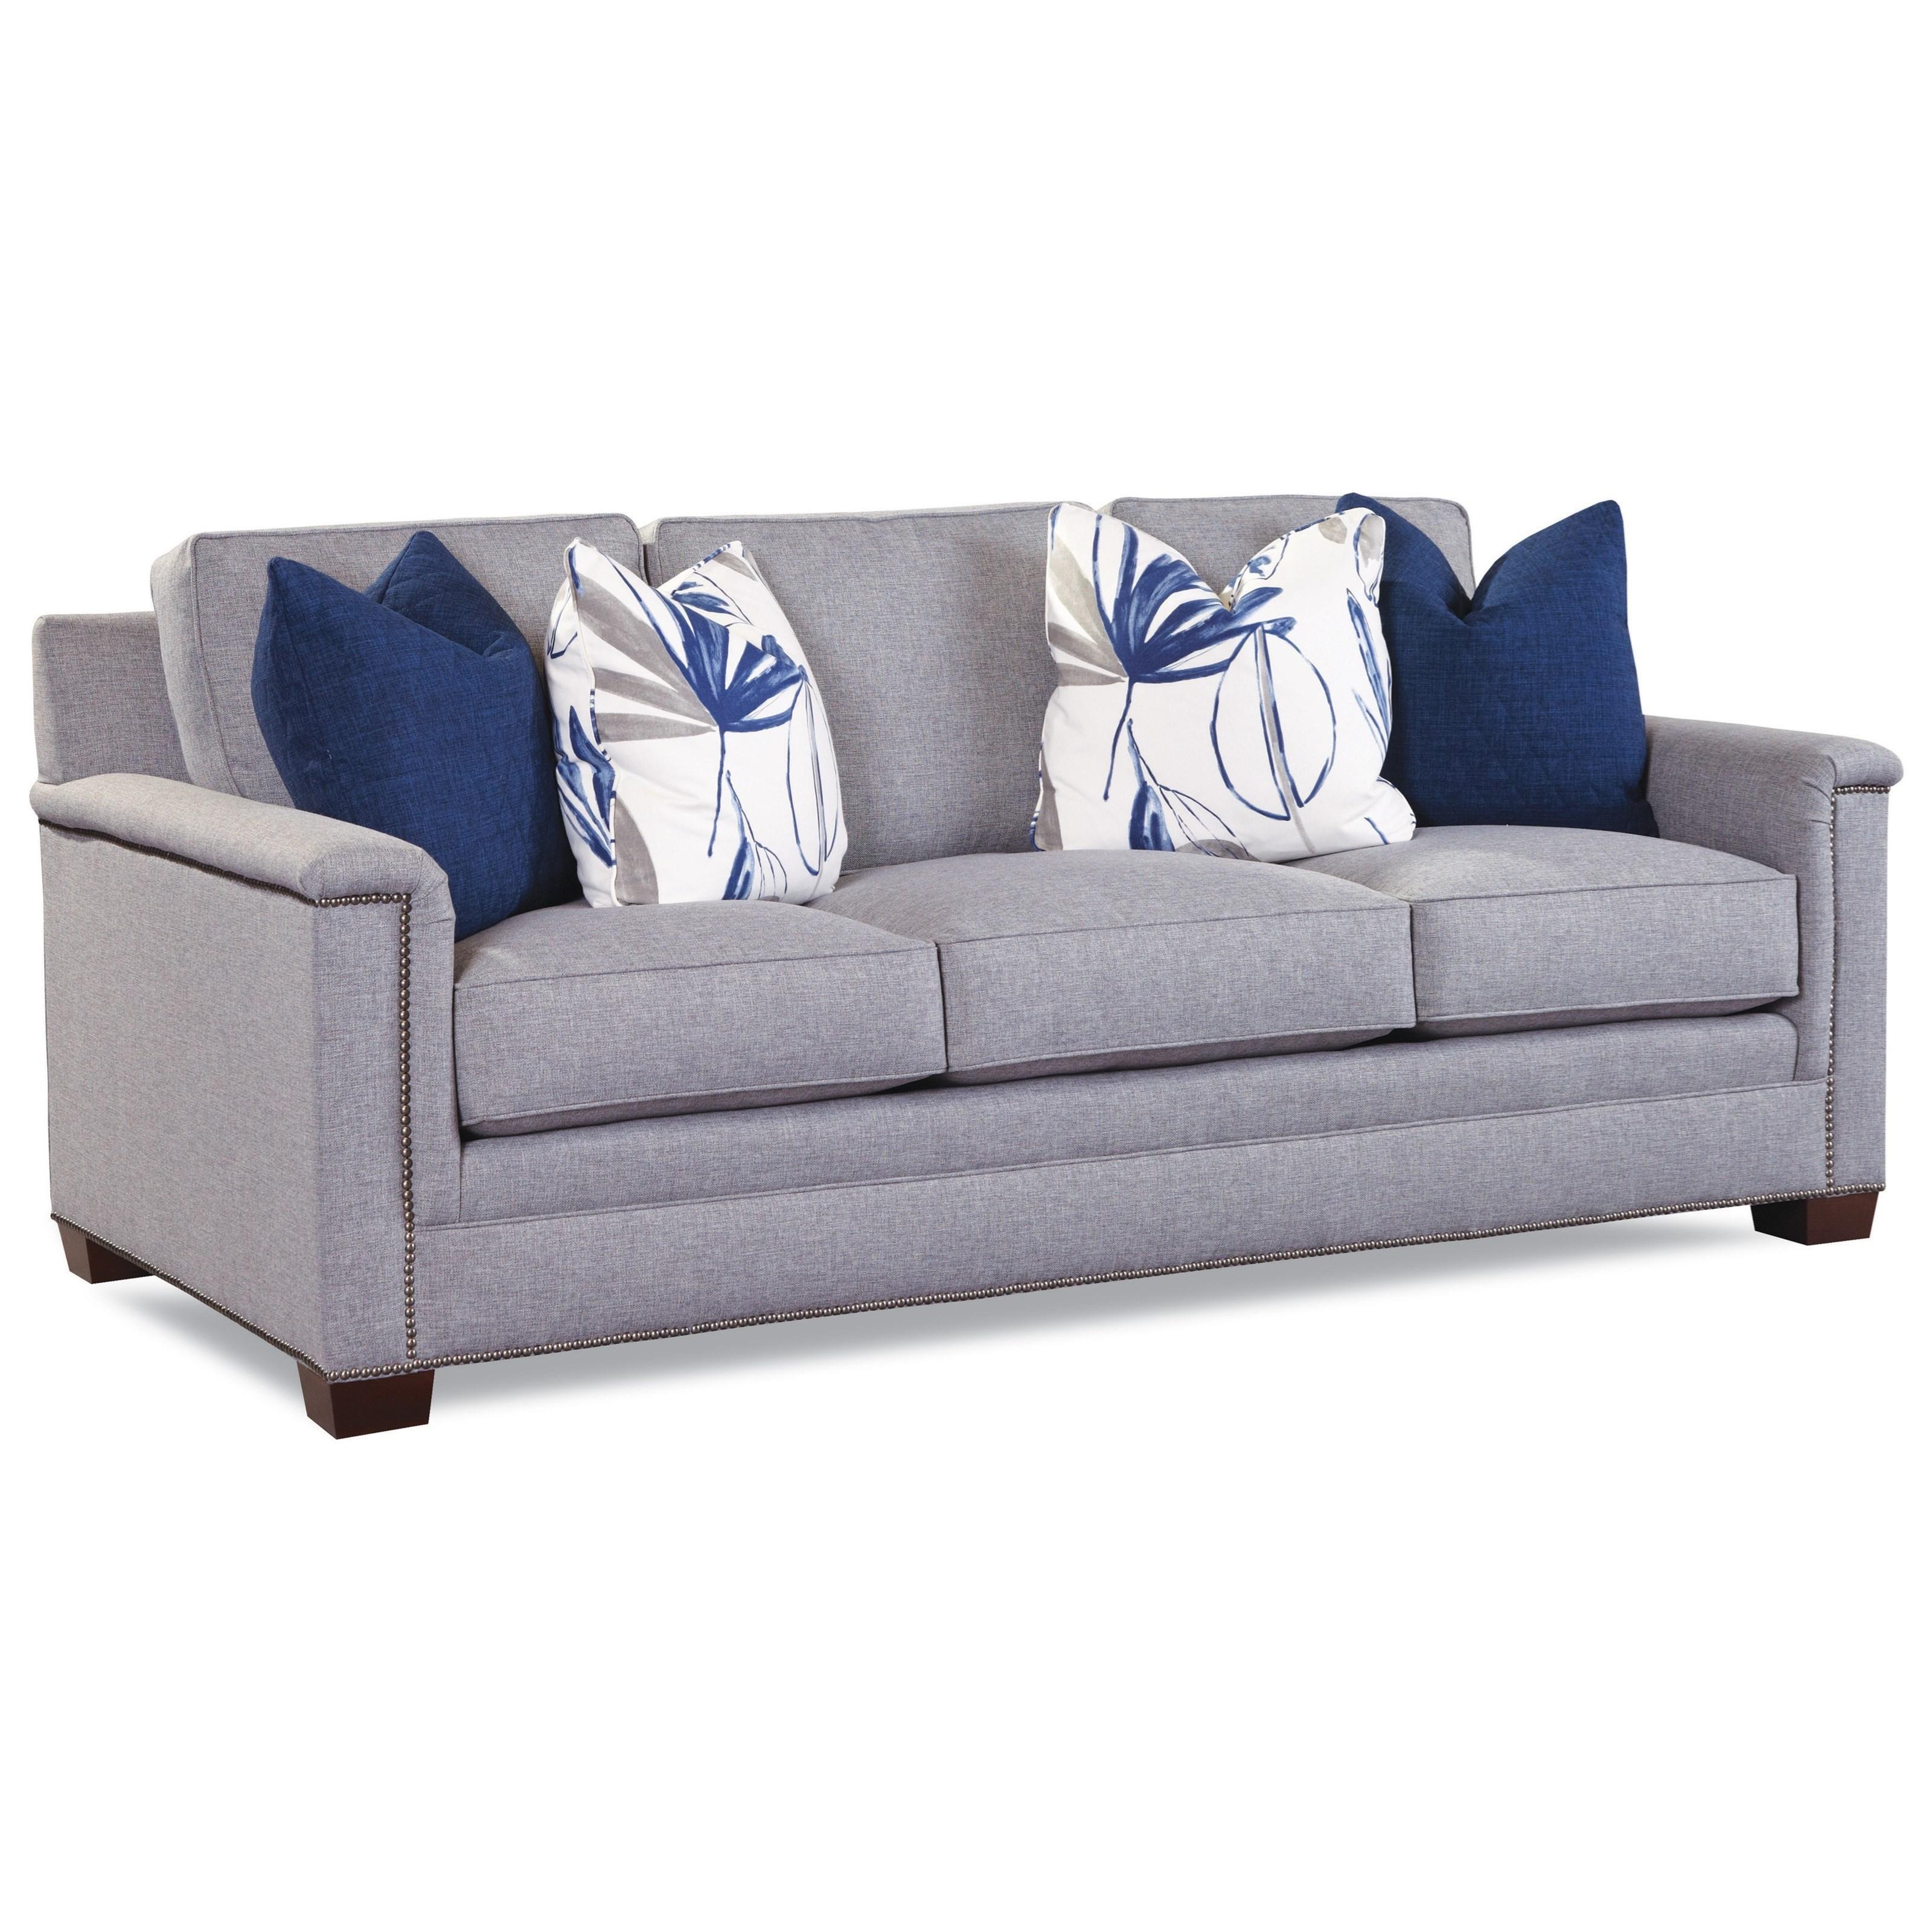 "2062 89"" Sofa by Huntington House at Baer's Furniture"